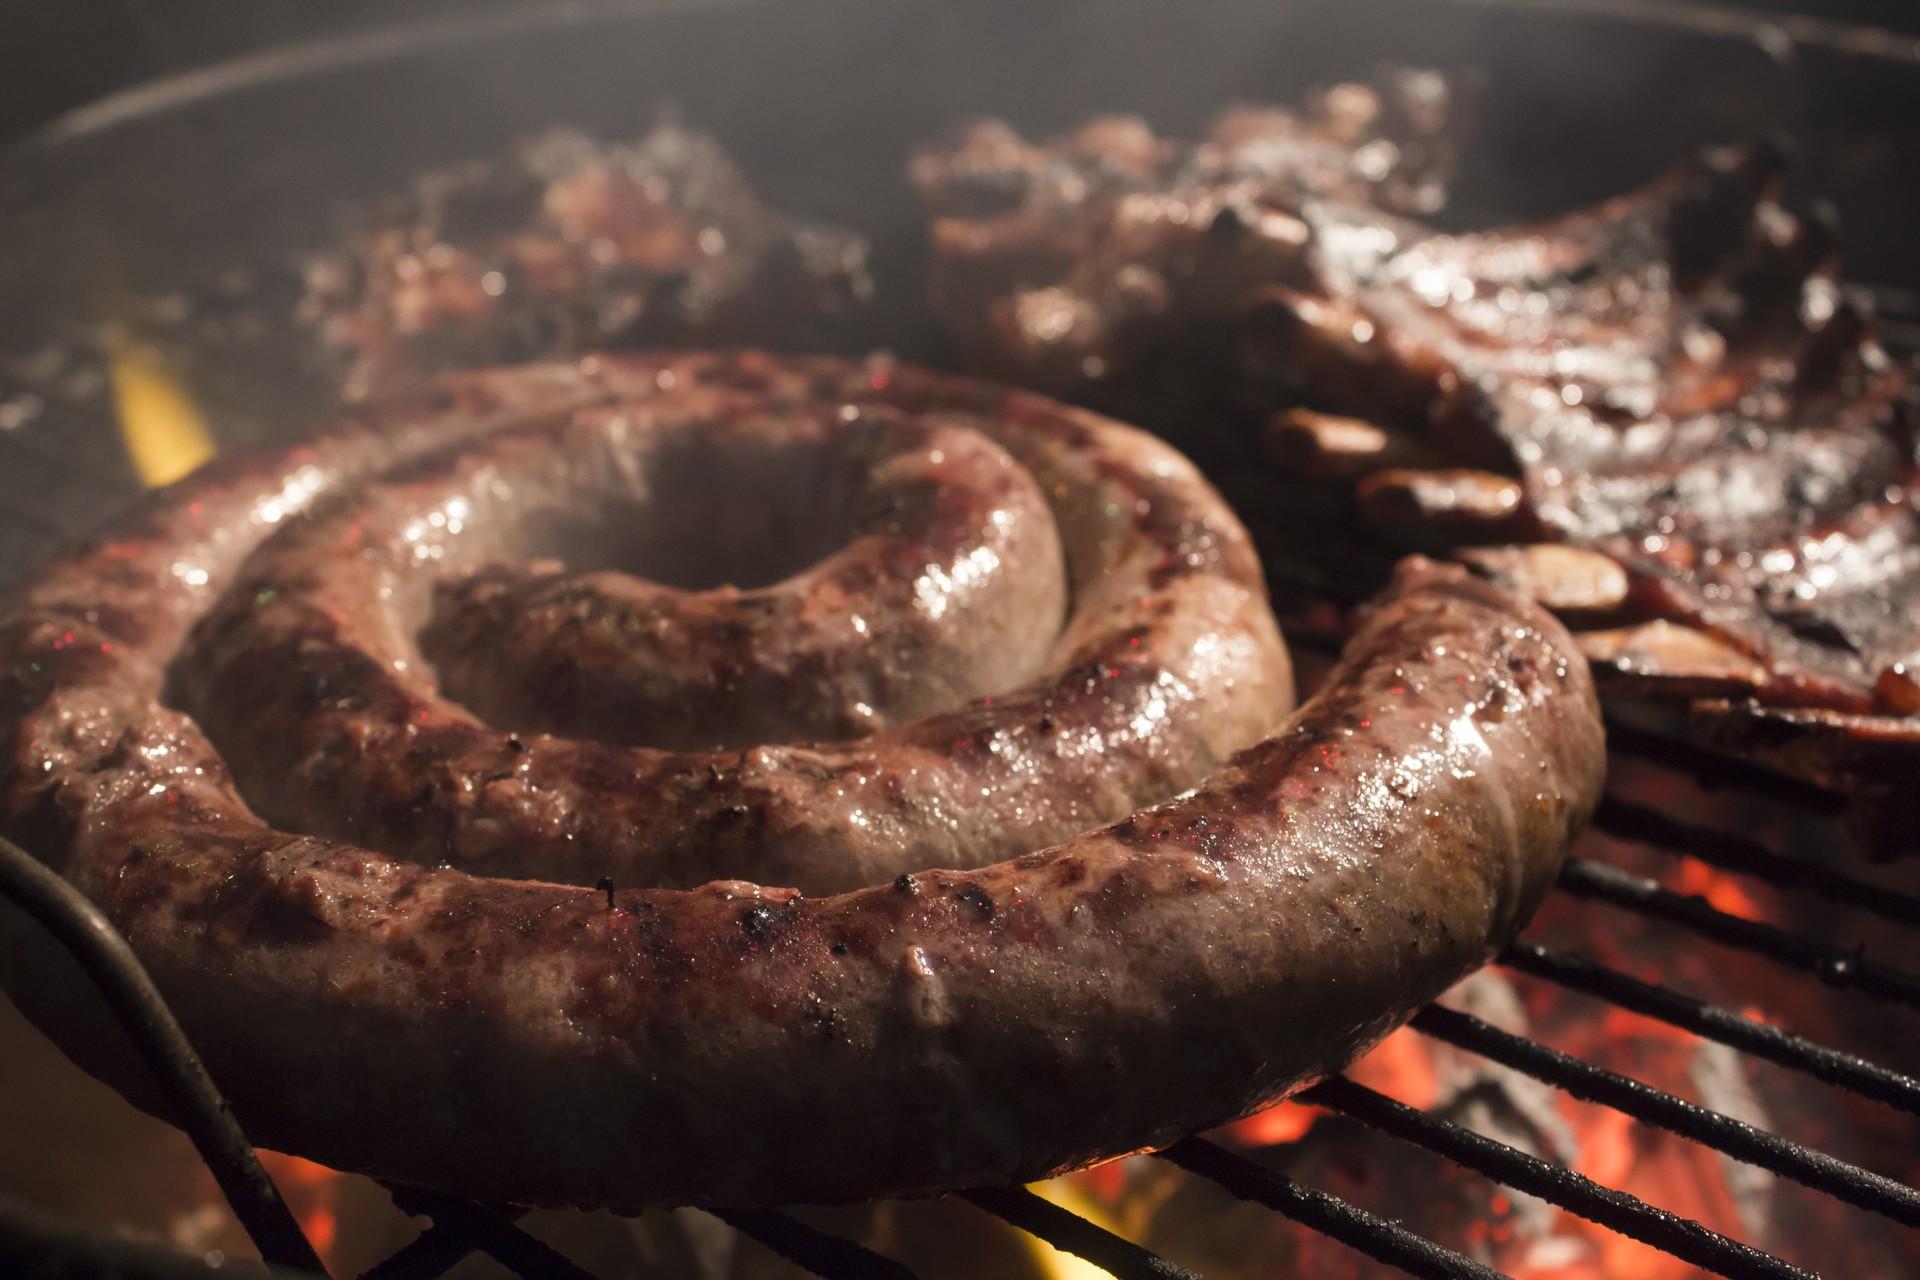 South Africa food tour - Braai boerewurs